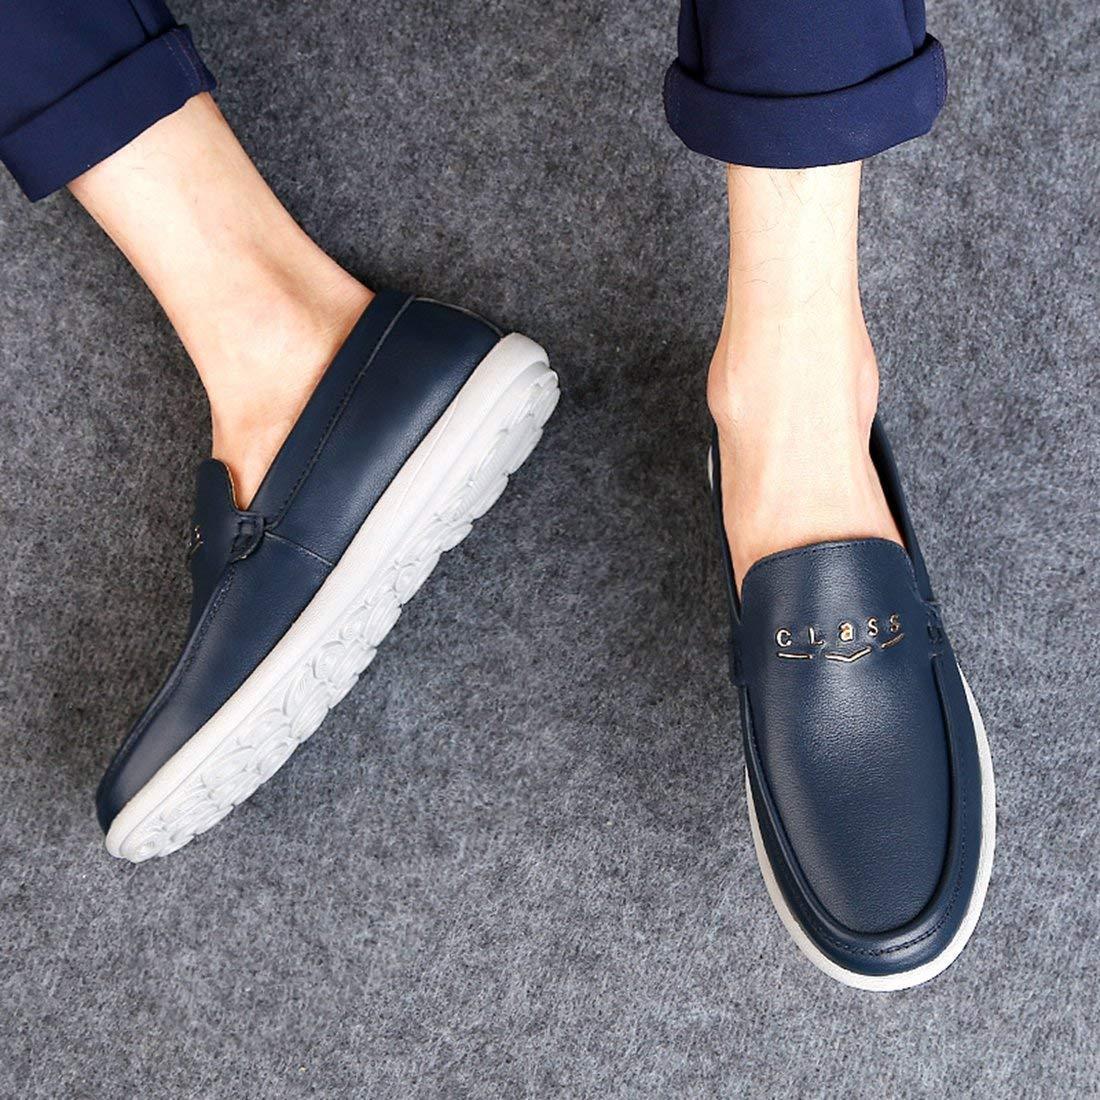 Qiusa Qiusa Qiusa Herren Gummisohle Slip-on Dunkelblau Synthetische Penny Loafers UK 9 (Farbe   -, Größe   -) 06b6c6